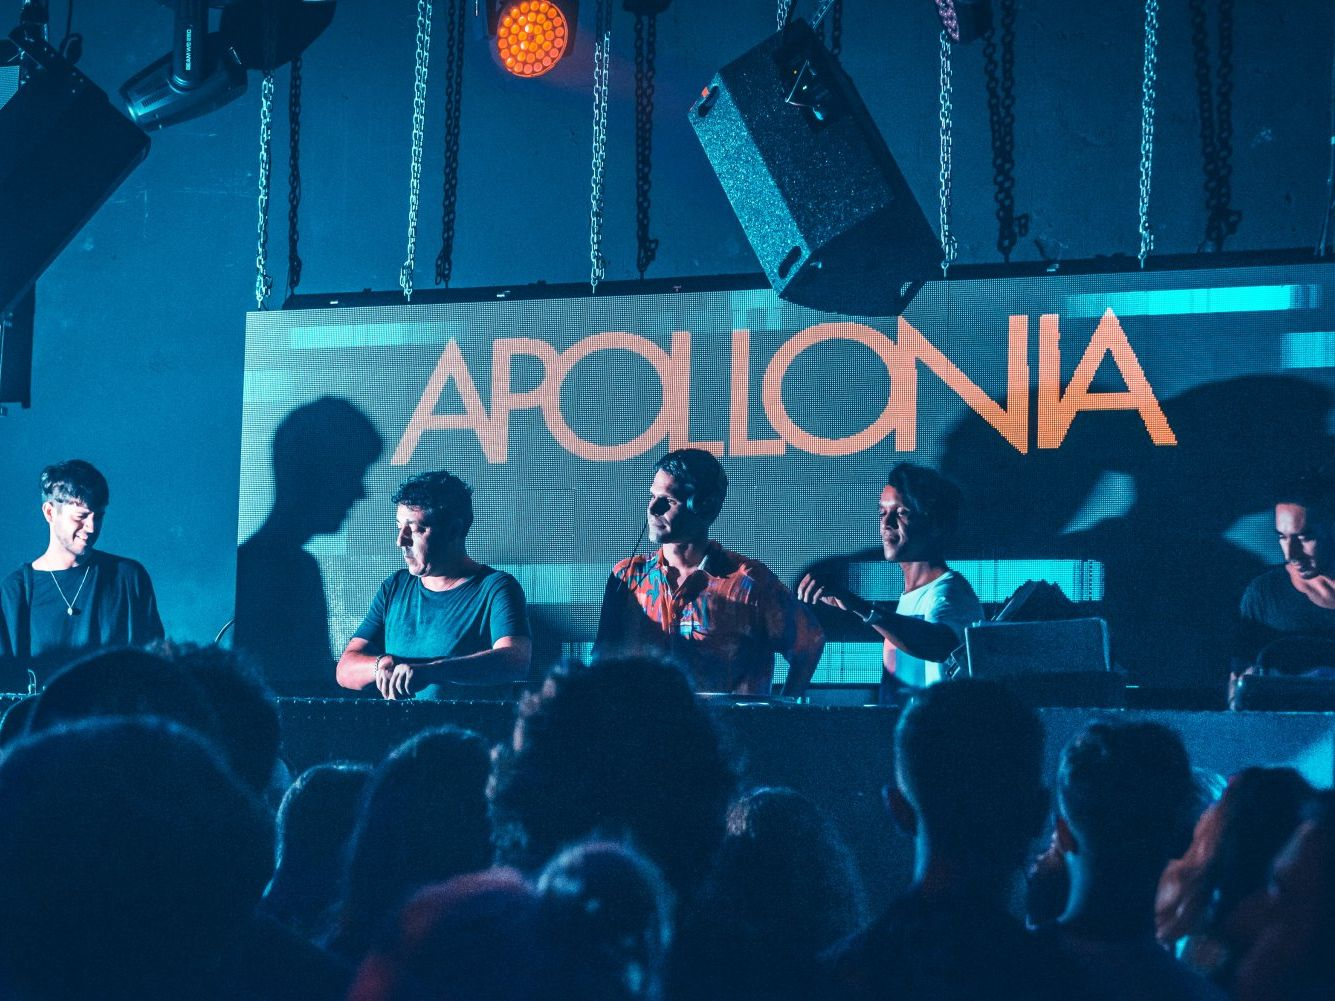 Apollonia party in Octan club Ibiza, Best new Ibiza parties